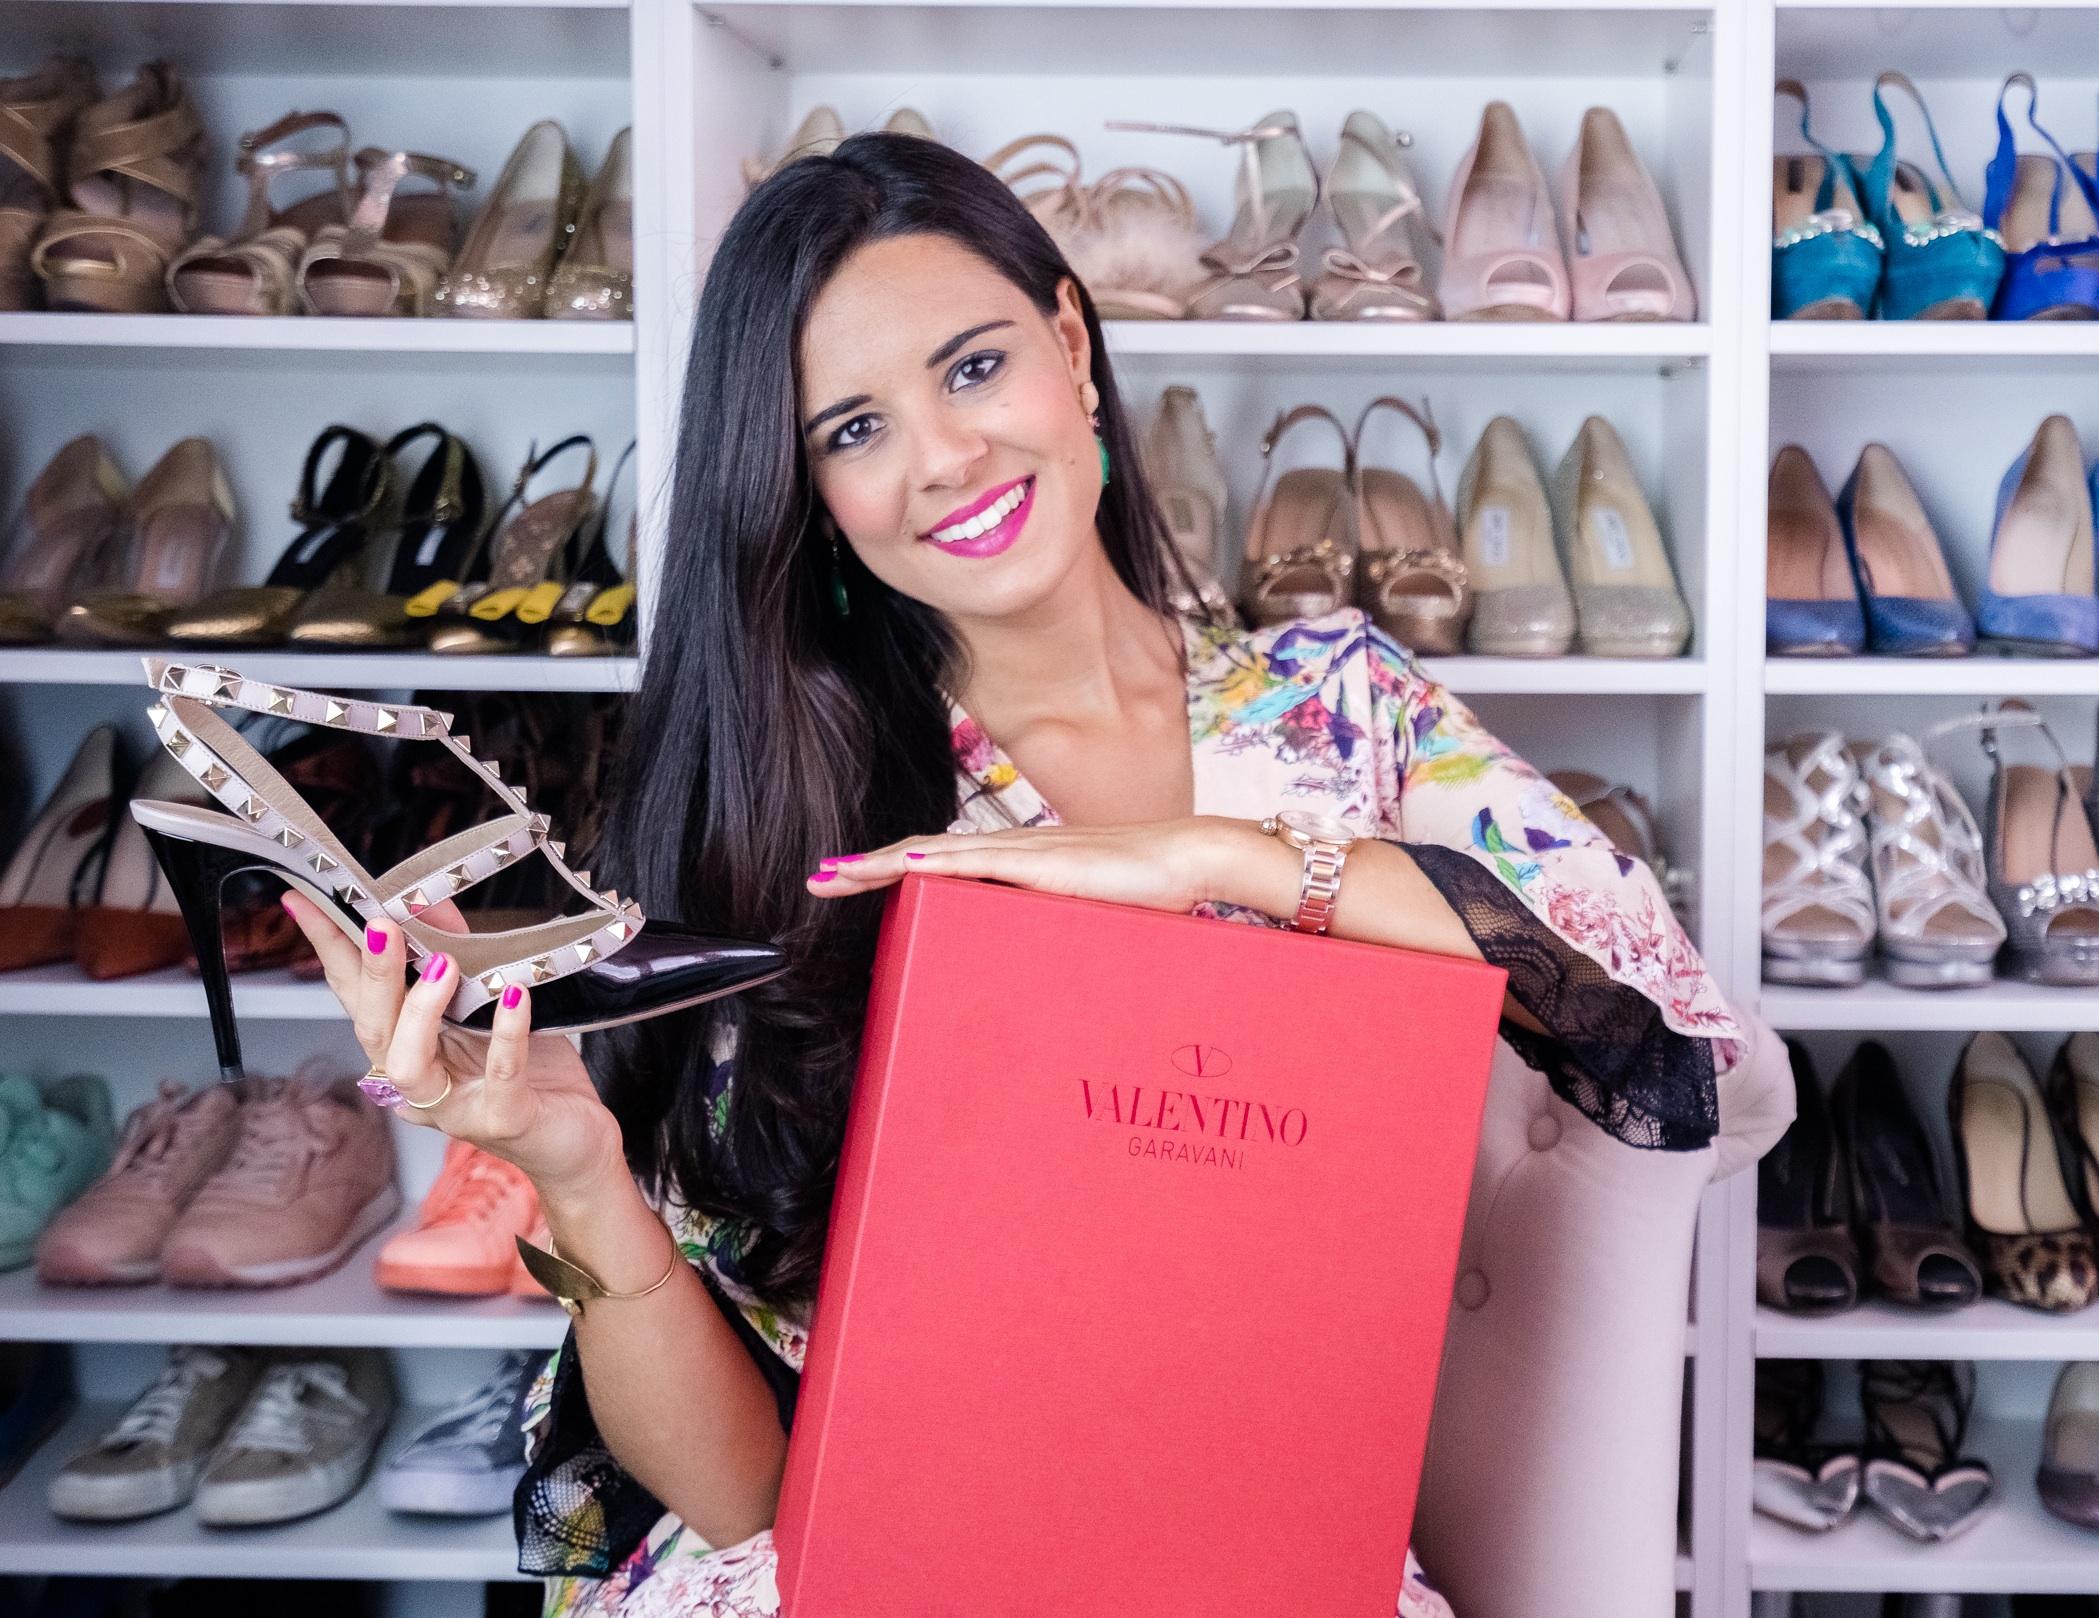 Vídeo Unboxing zapatos Valentino Rockstud-23256-crimenesdelamoda